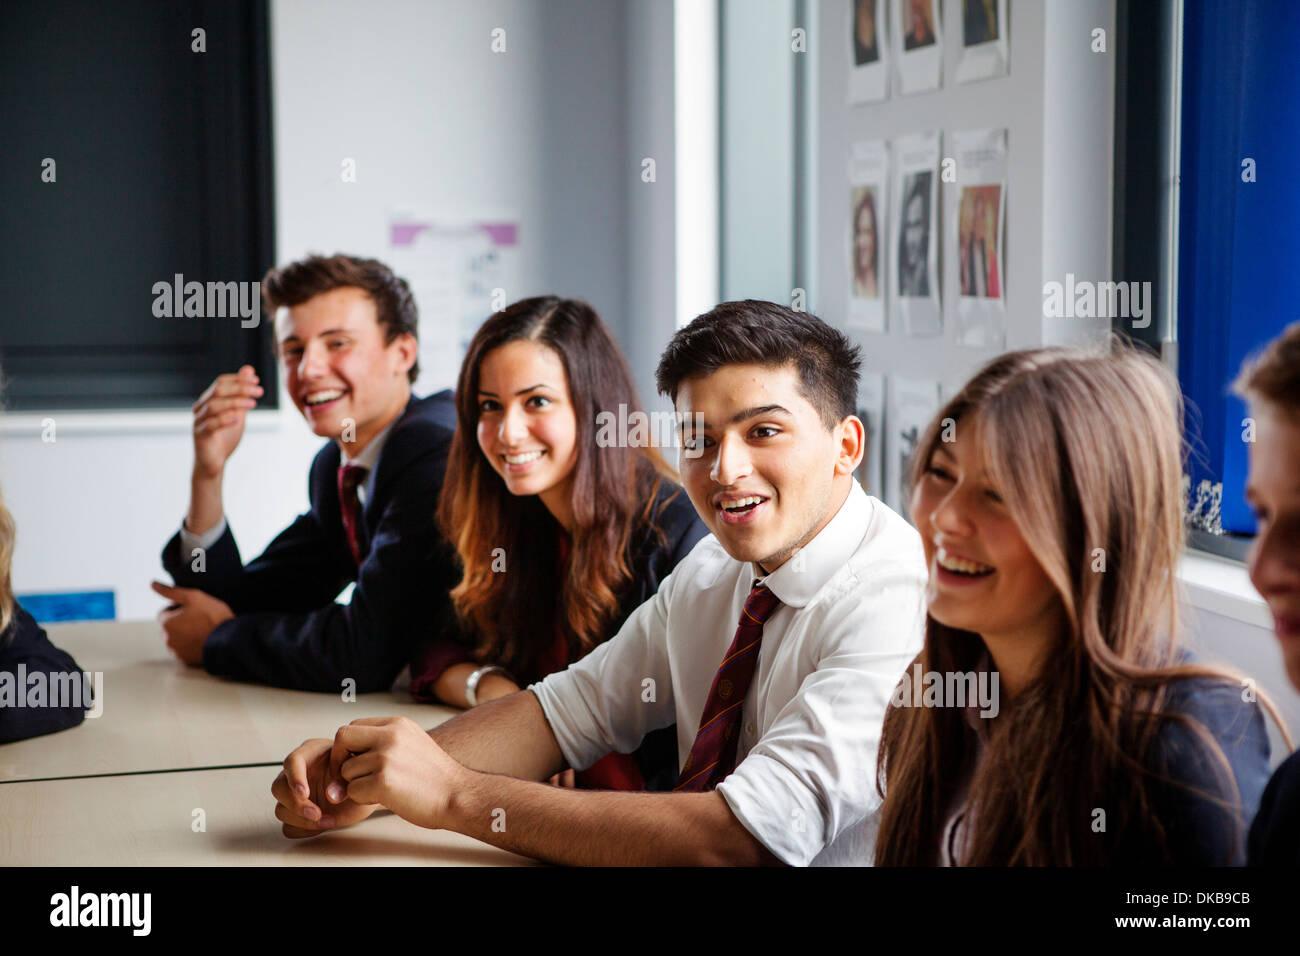 Teenage schoolchildren sitting at desks in classroom - Stock Image